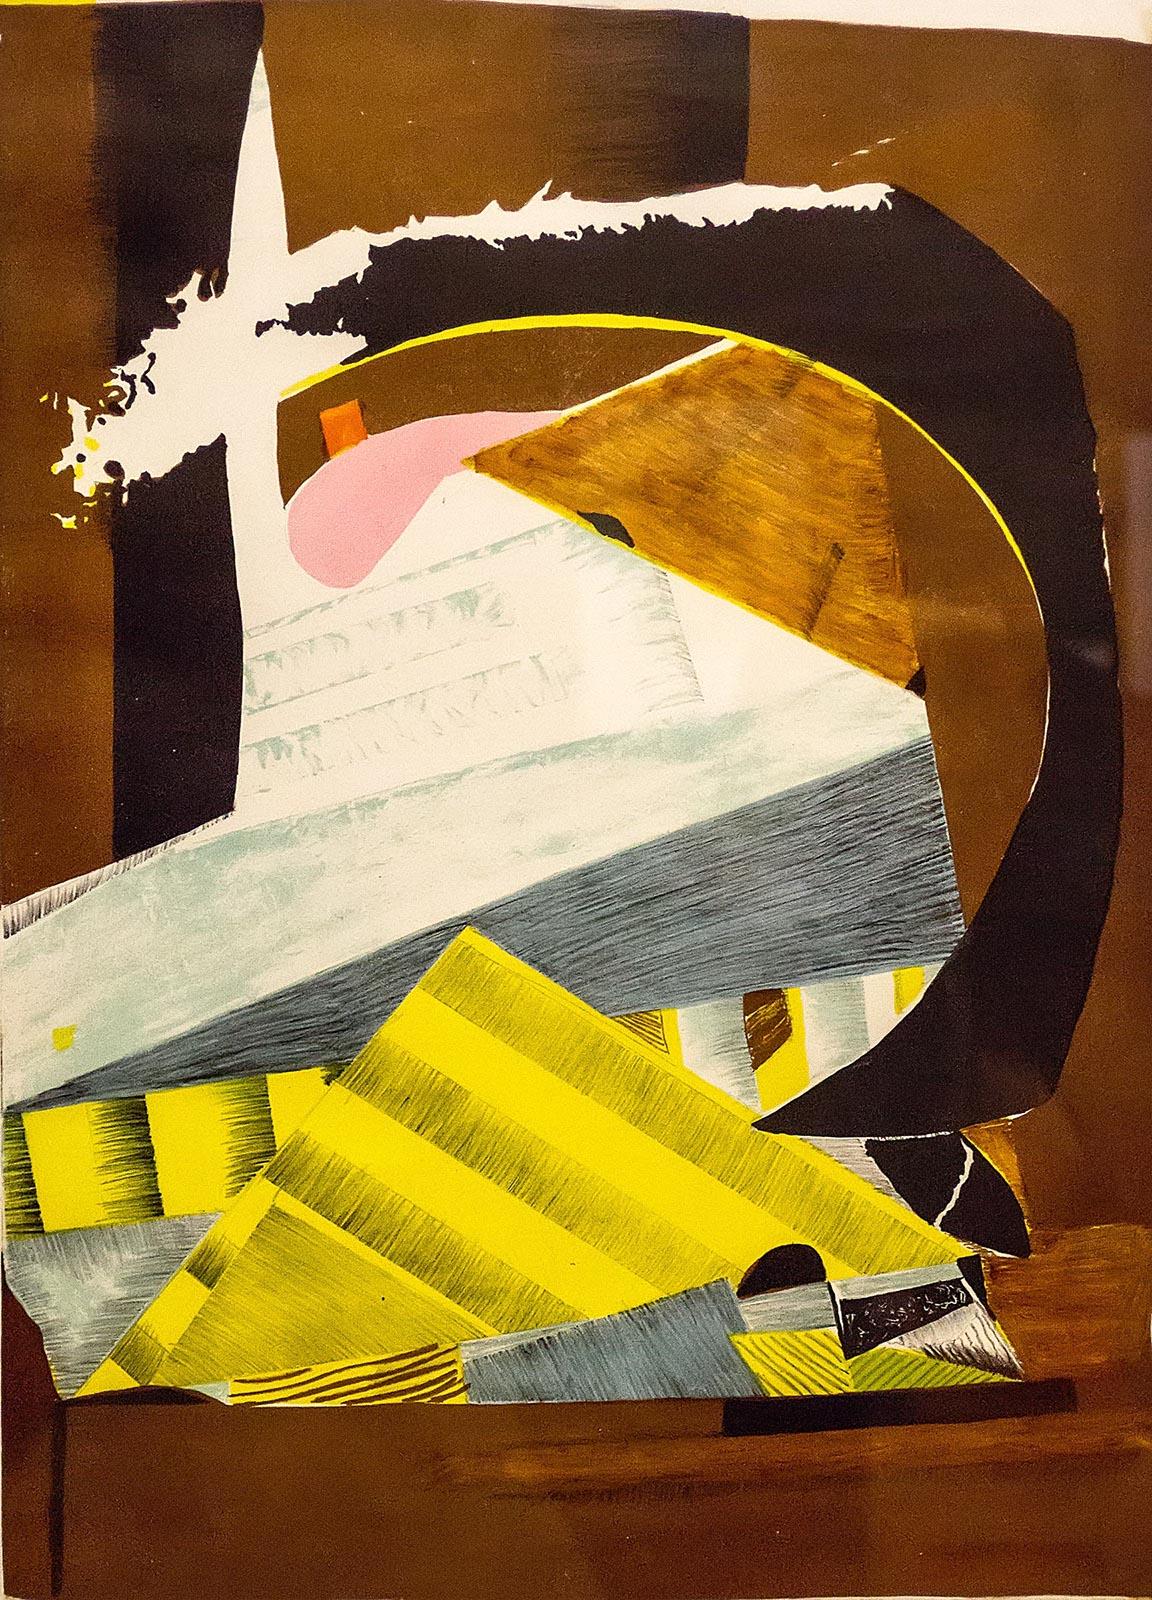 Фото №203929. ДАНИЛЕНКО ВАЛЕНТИН НИКОЛАЕВИЧ. 1953 Латвия, Рига ХРАМ ДЛЯ АТЕИСТА. 2012 Бумага, цветная литография